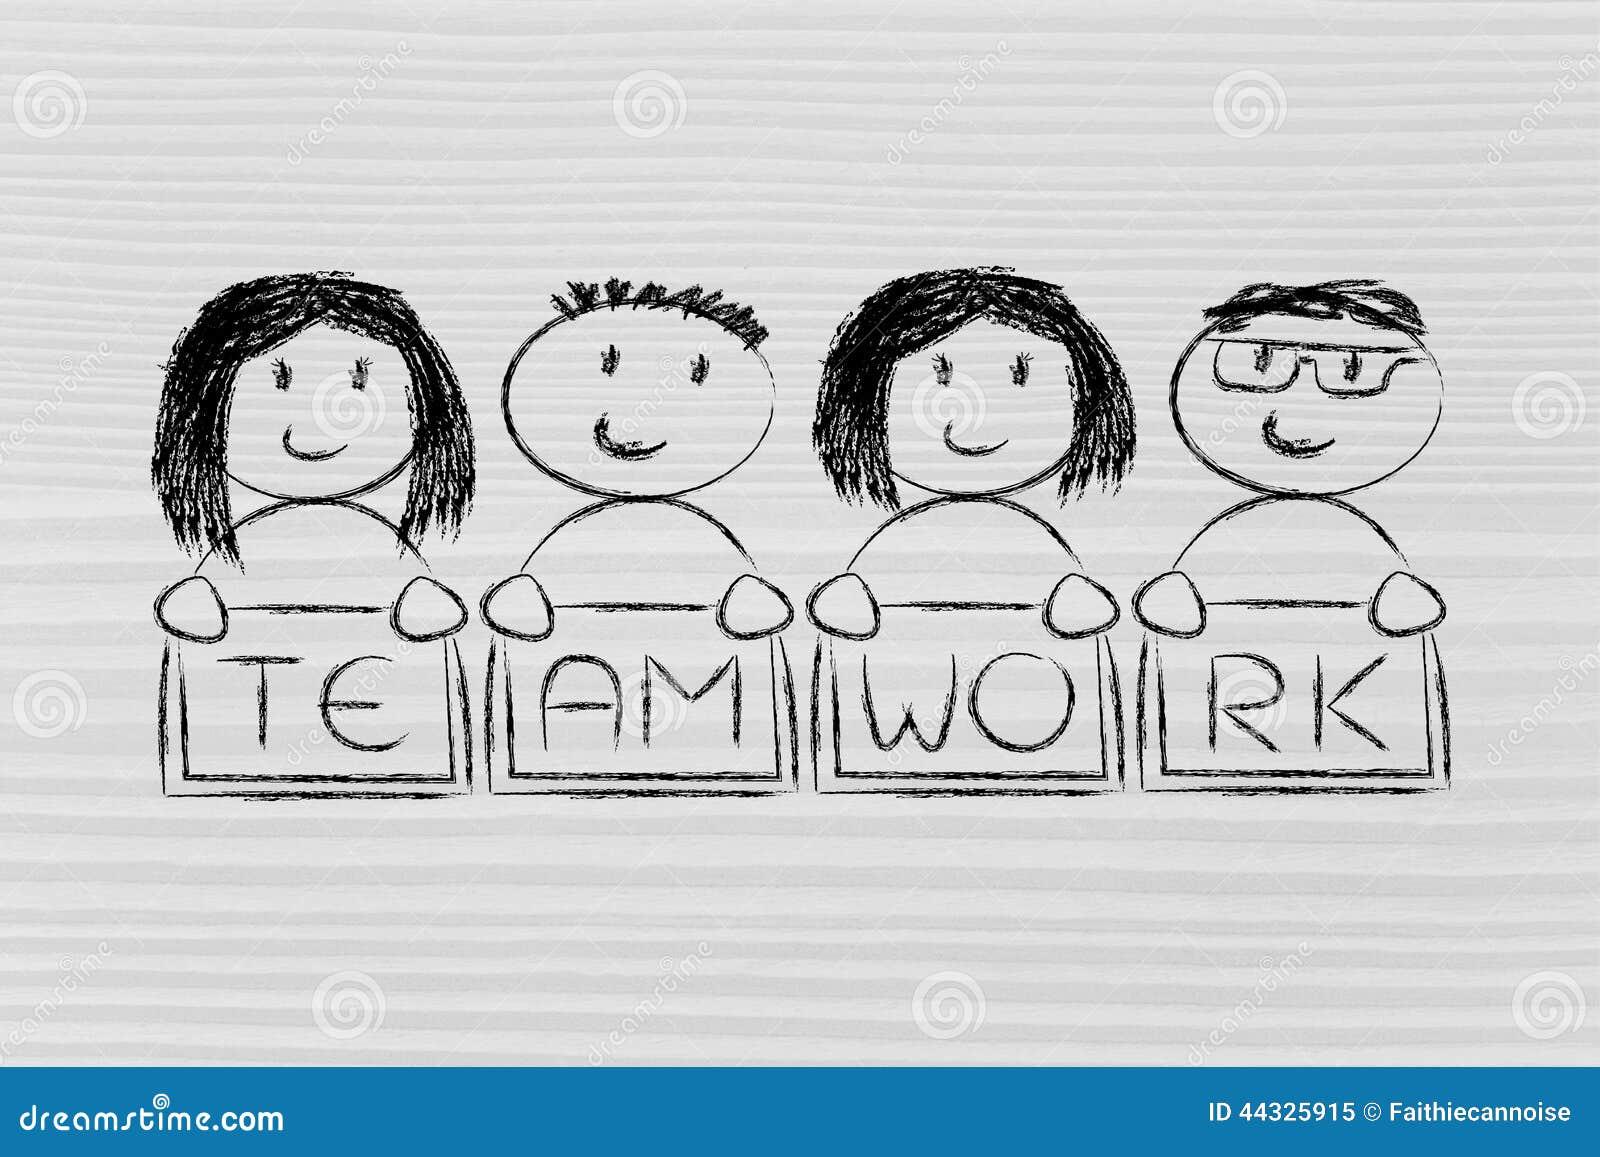 Stock Illustration Collaboration Sharing Work Team Work Funny Characters Illu Workforce Men Women Image44325915 additionally Broken Tree Logo also Button Packaging besides Evolution in addition Rene descartes. on business process illustration